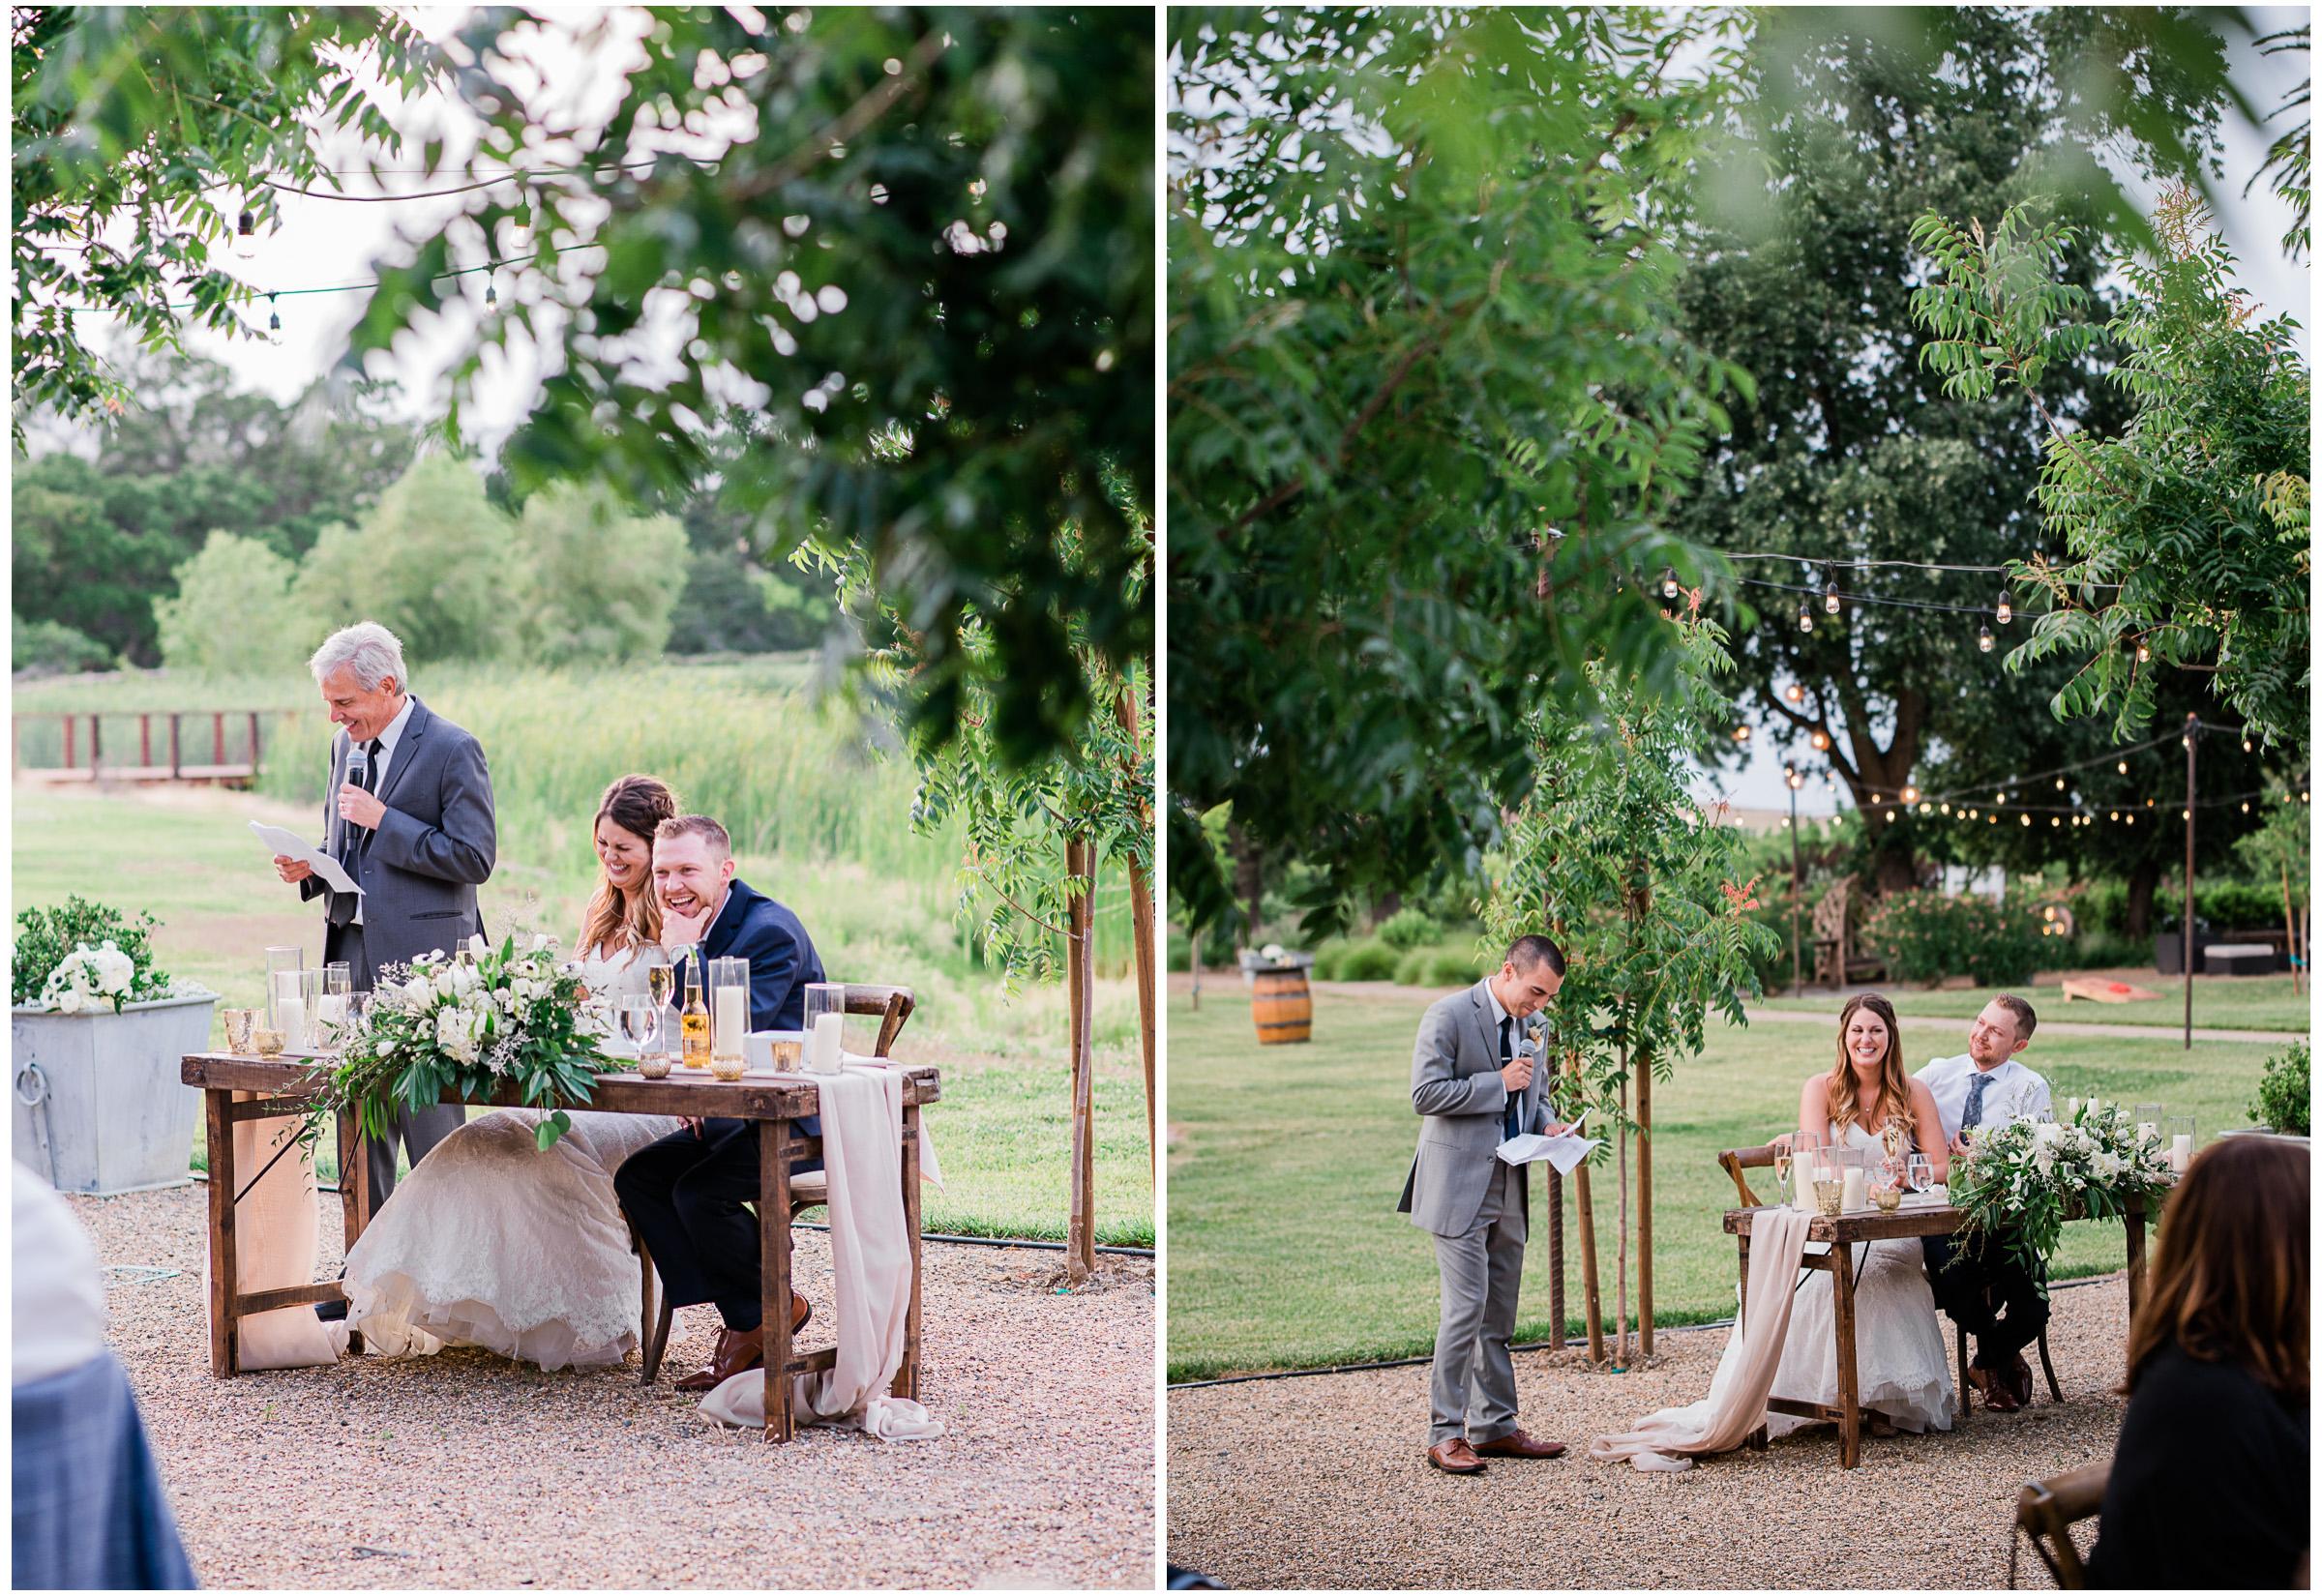 Winters Wedding - Sacramento Photographer - Field & Pond - Justin Wilcox Photography - 31.jpg